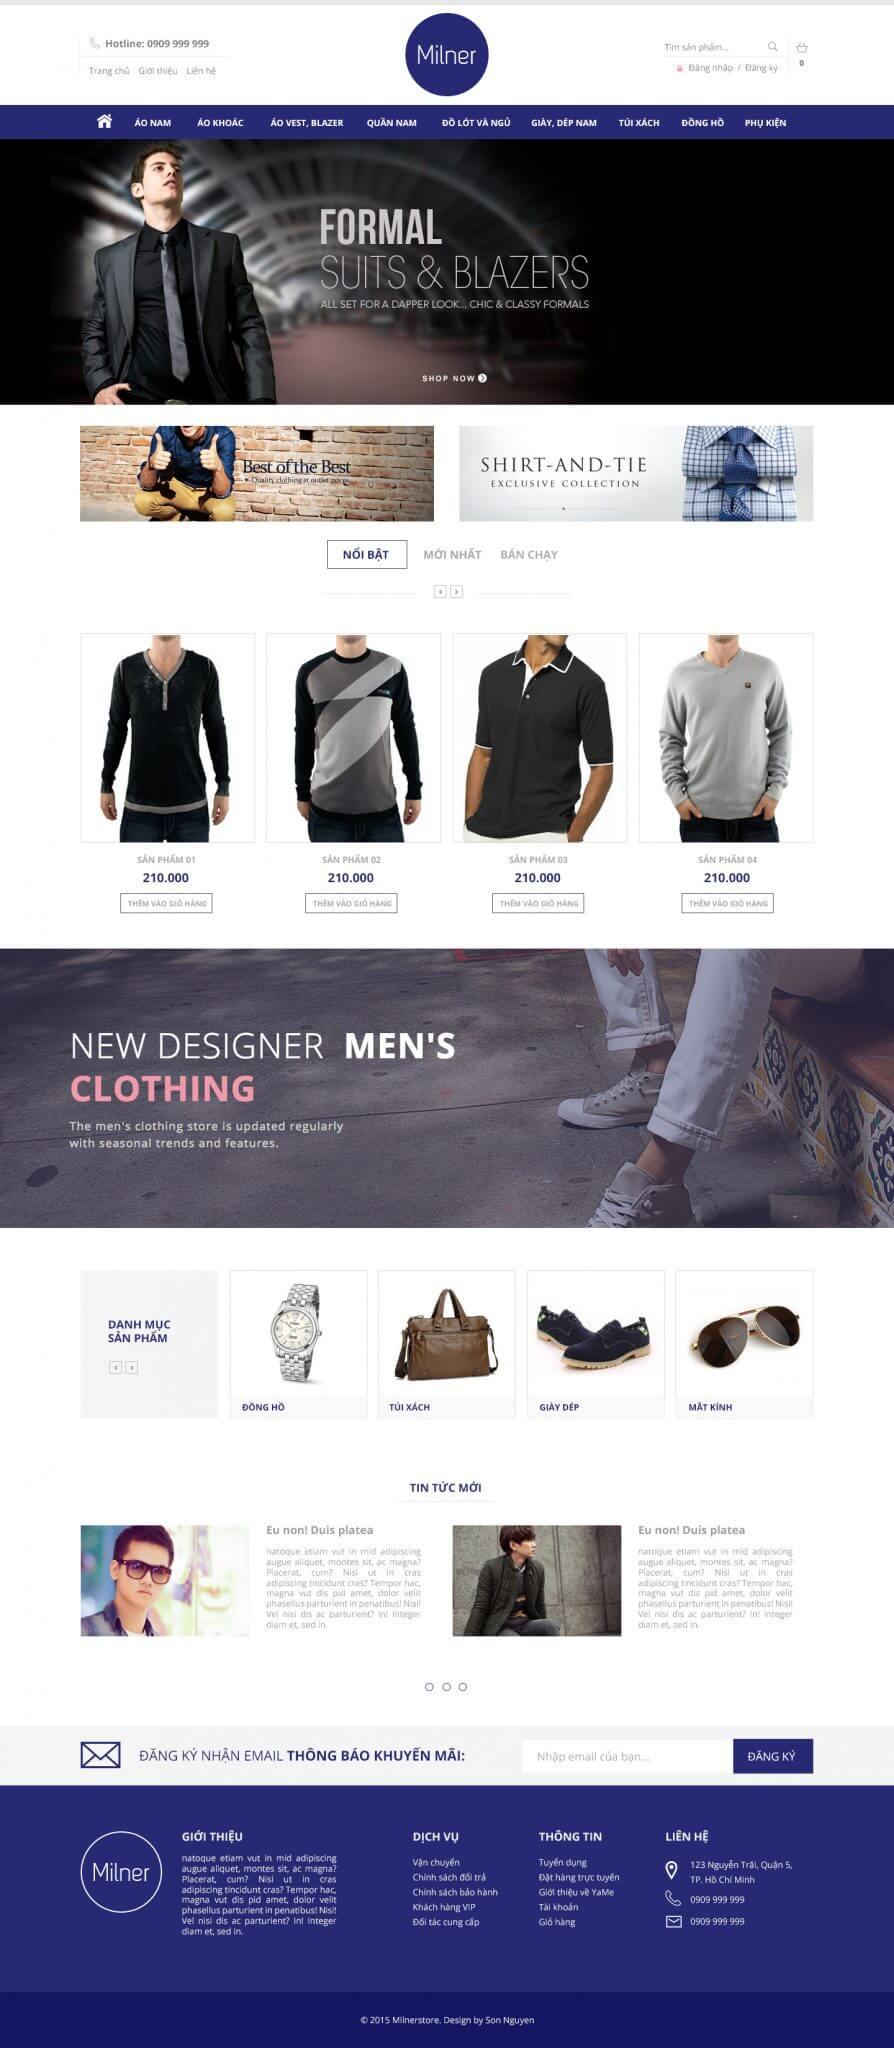 Milner Homepage demo - Milner Fashion